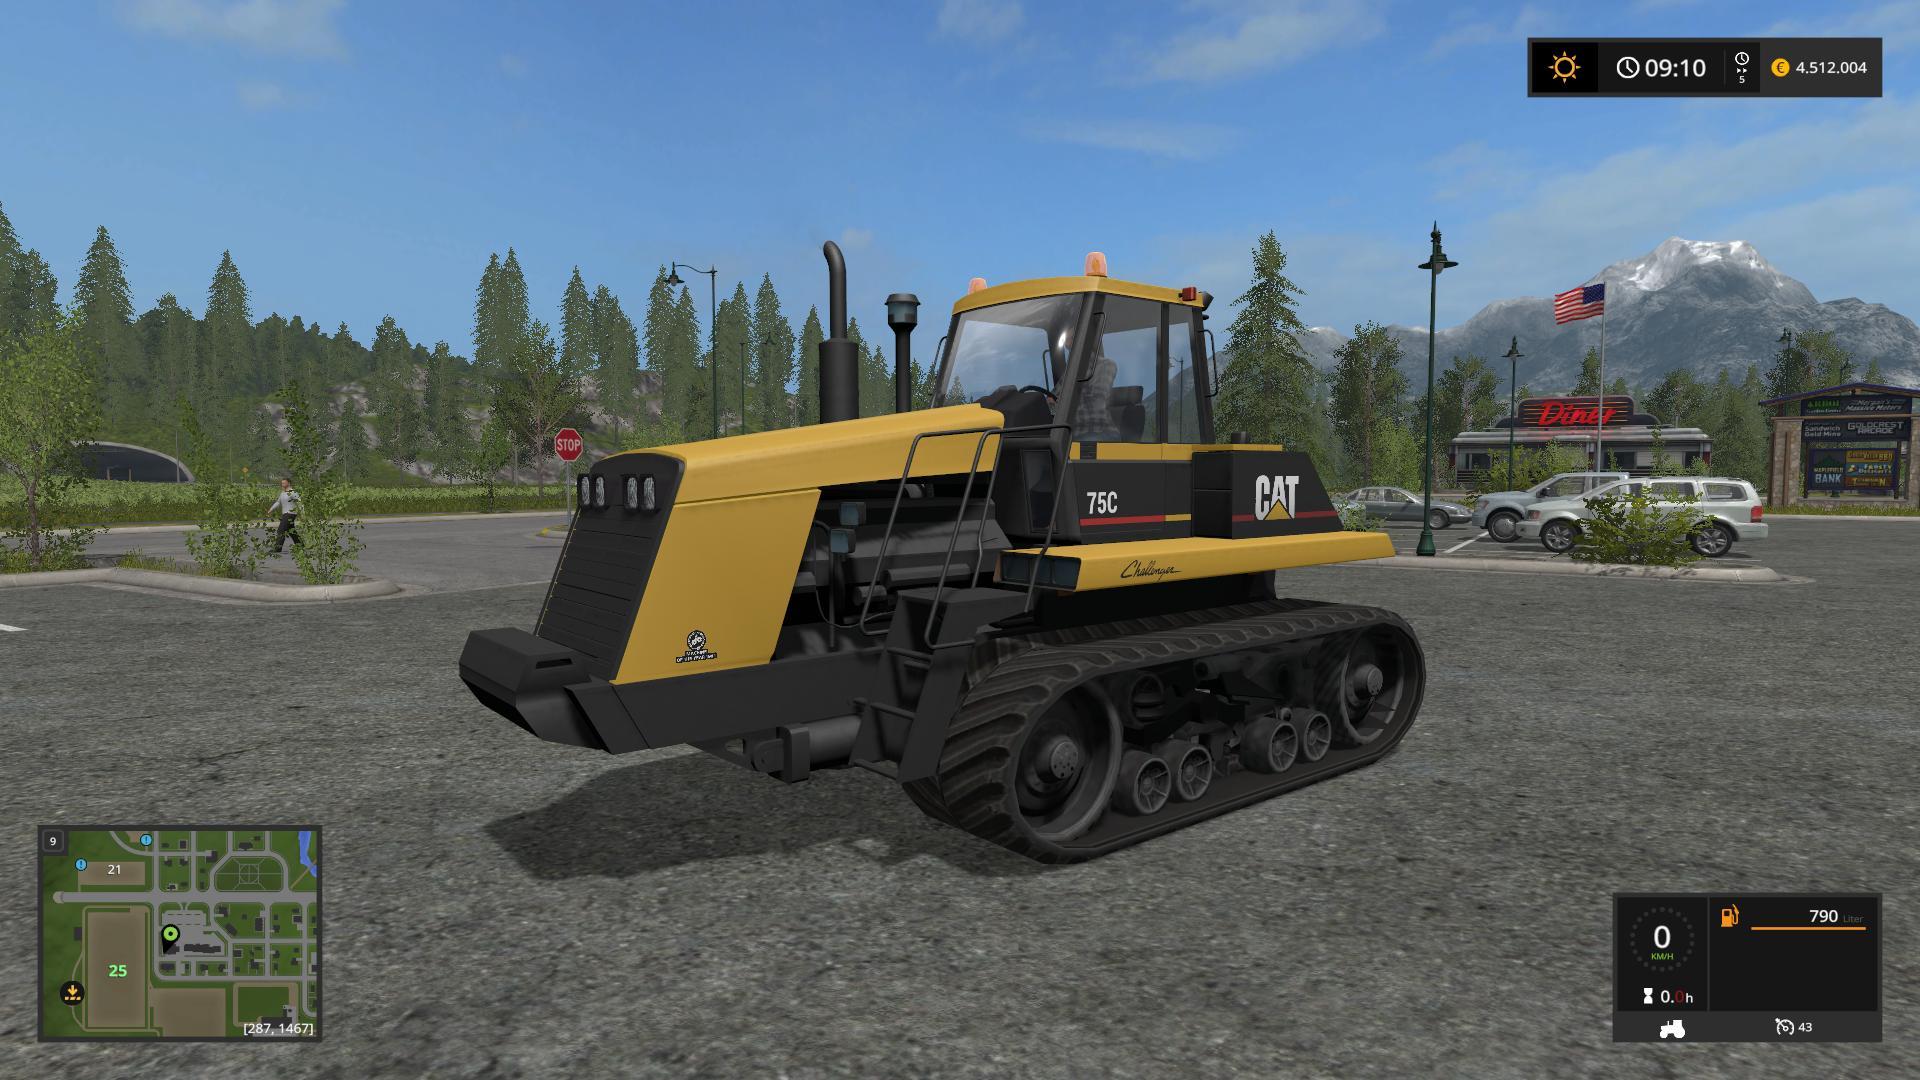 Мод трактор CATERPILLAR 75C V1.1.0.0 Farming Simulator 2017